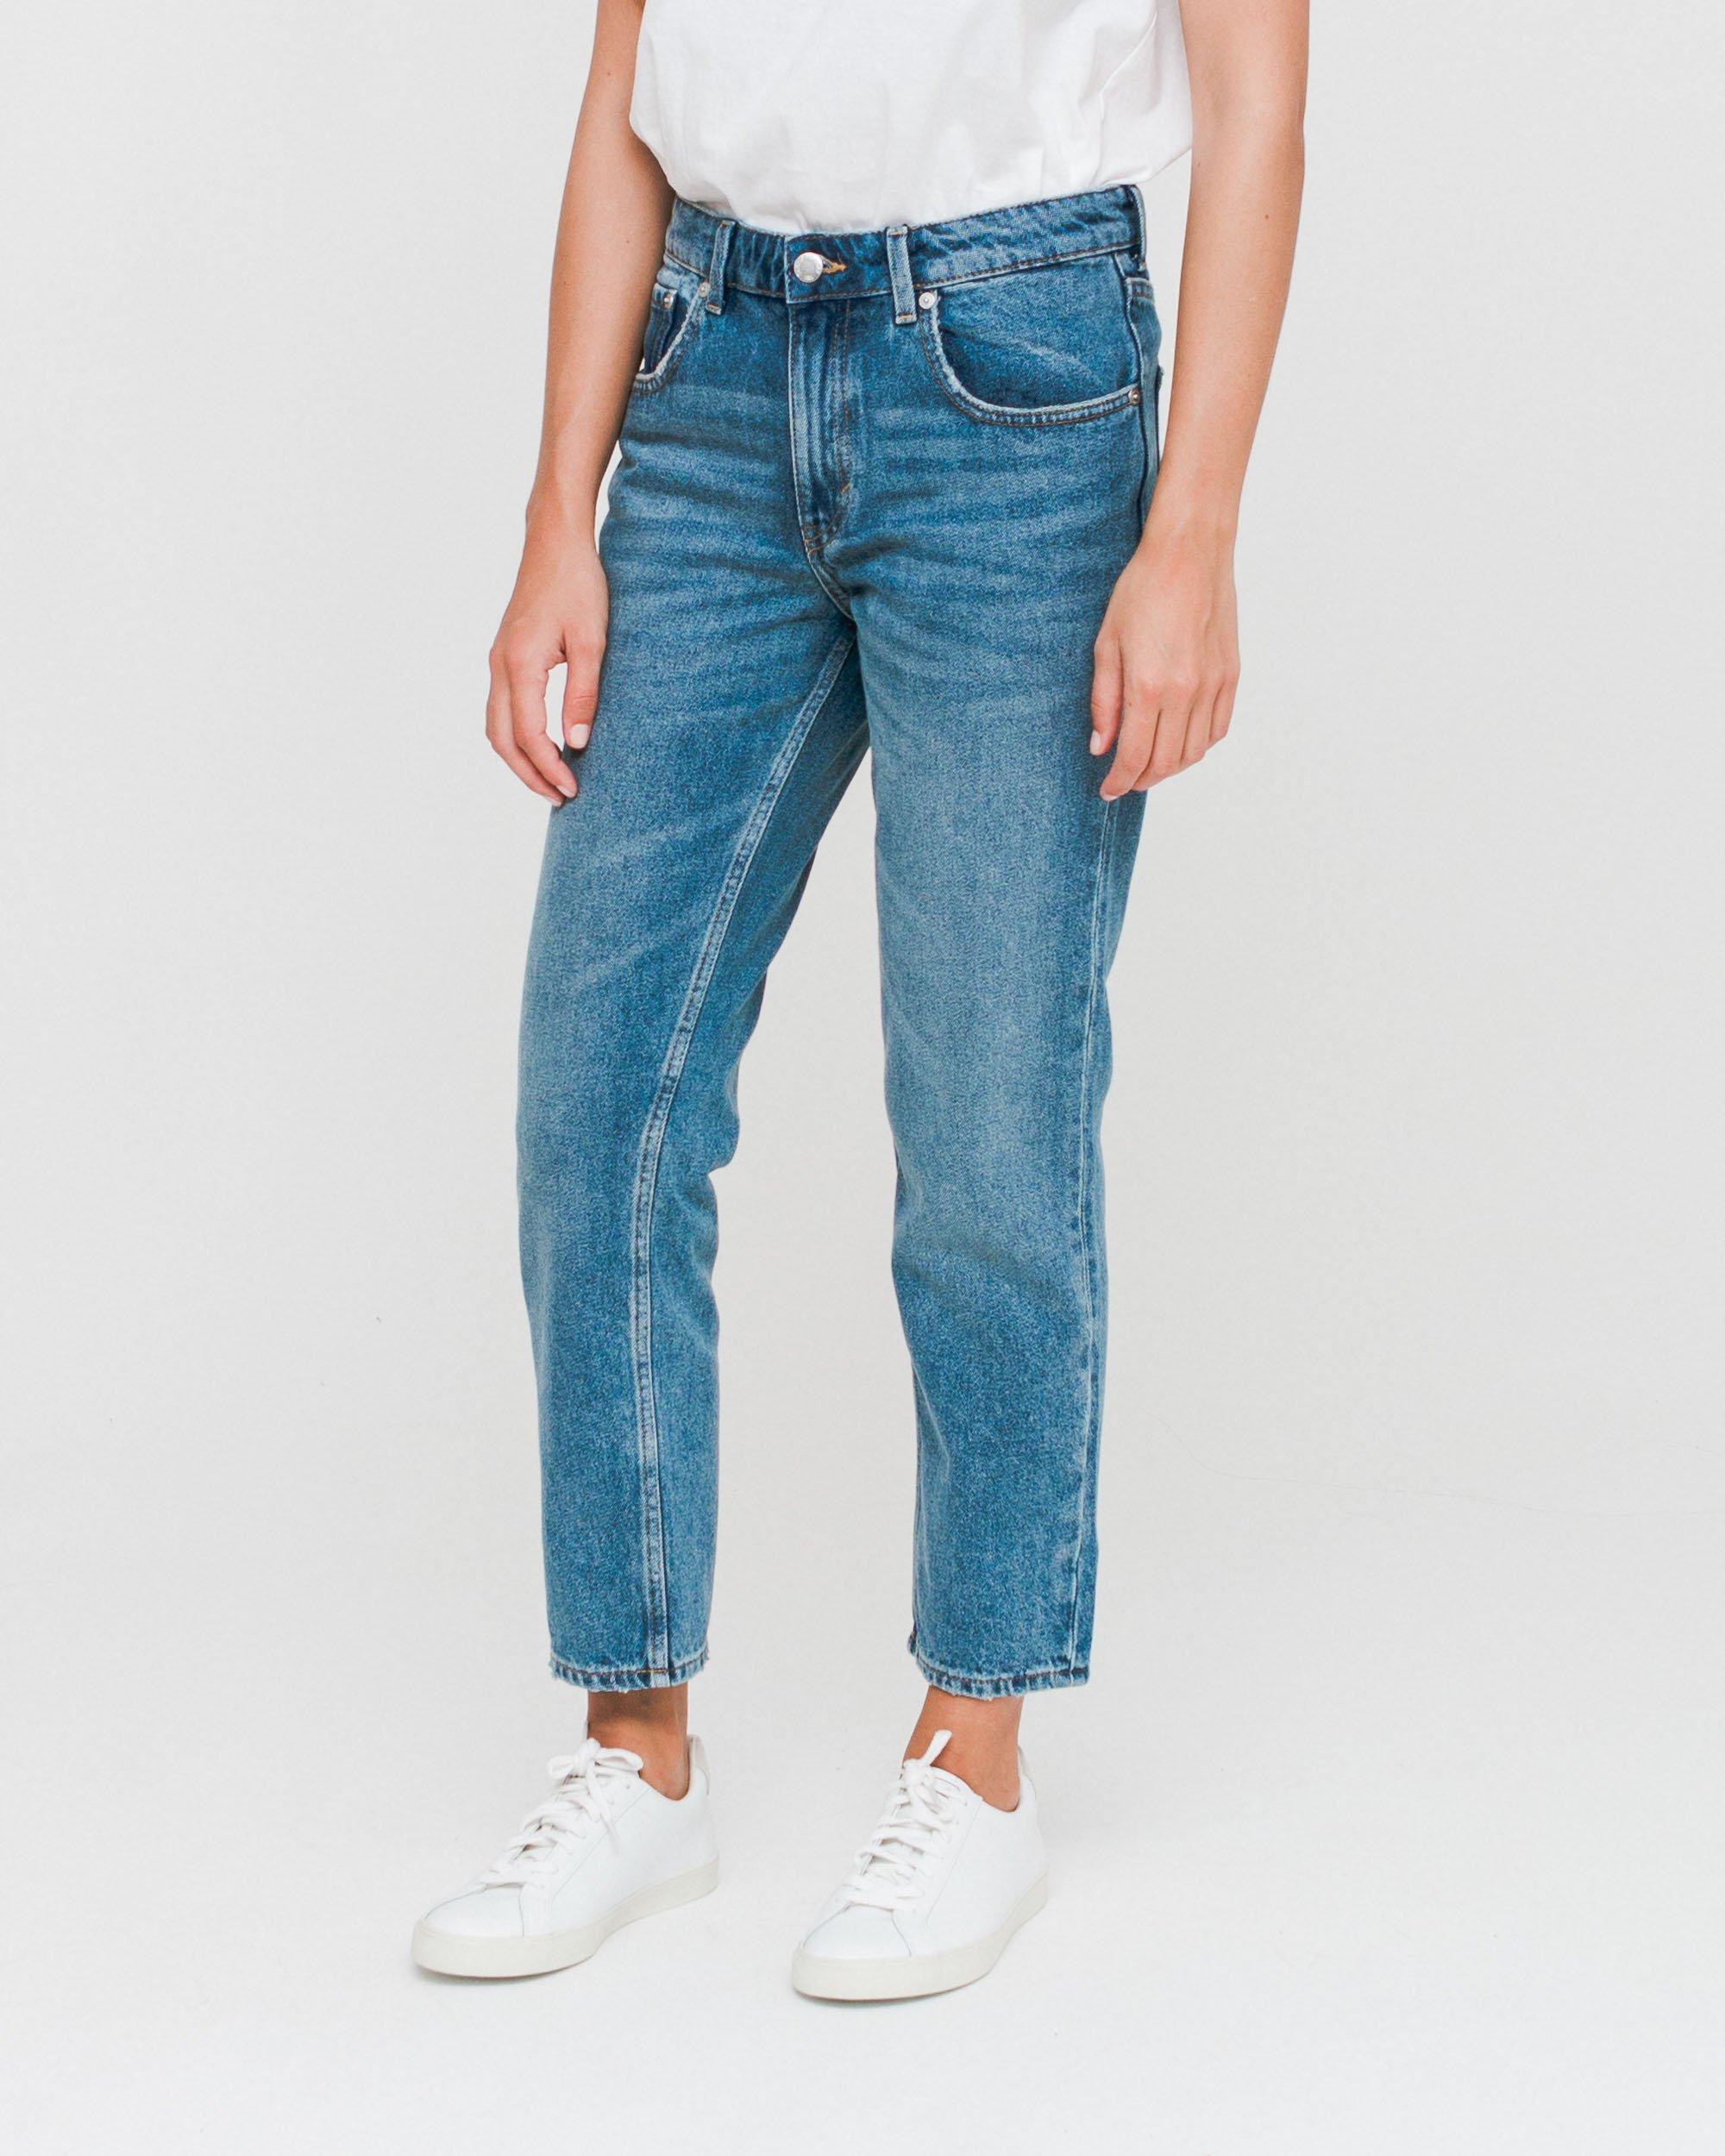 bd0e829f48ef84 Cheap Monday Revive Jeans - Demand Blue | Garmentory